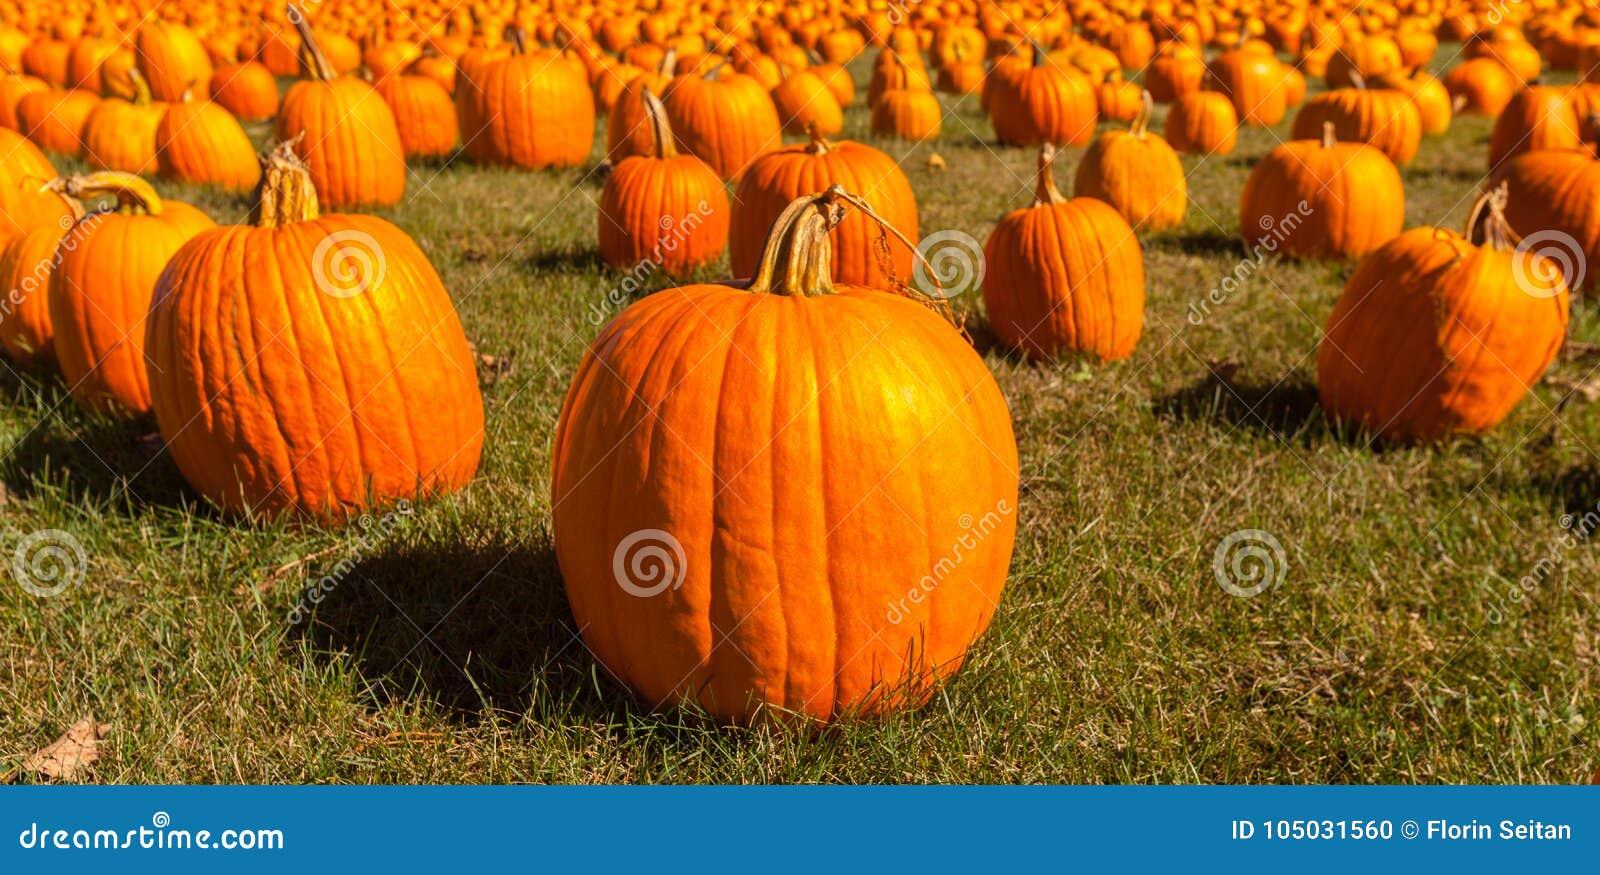 Pumpkin Patch Field With Bright Orange Pumpkins On Green